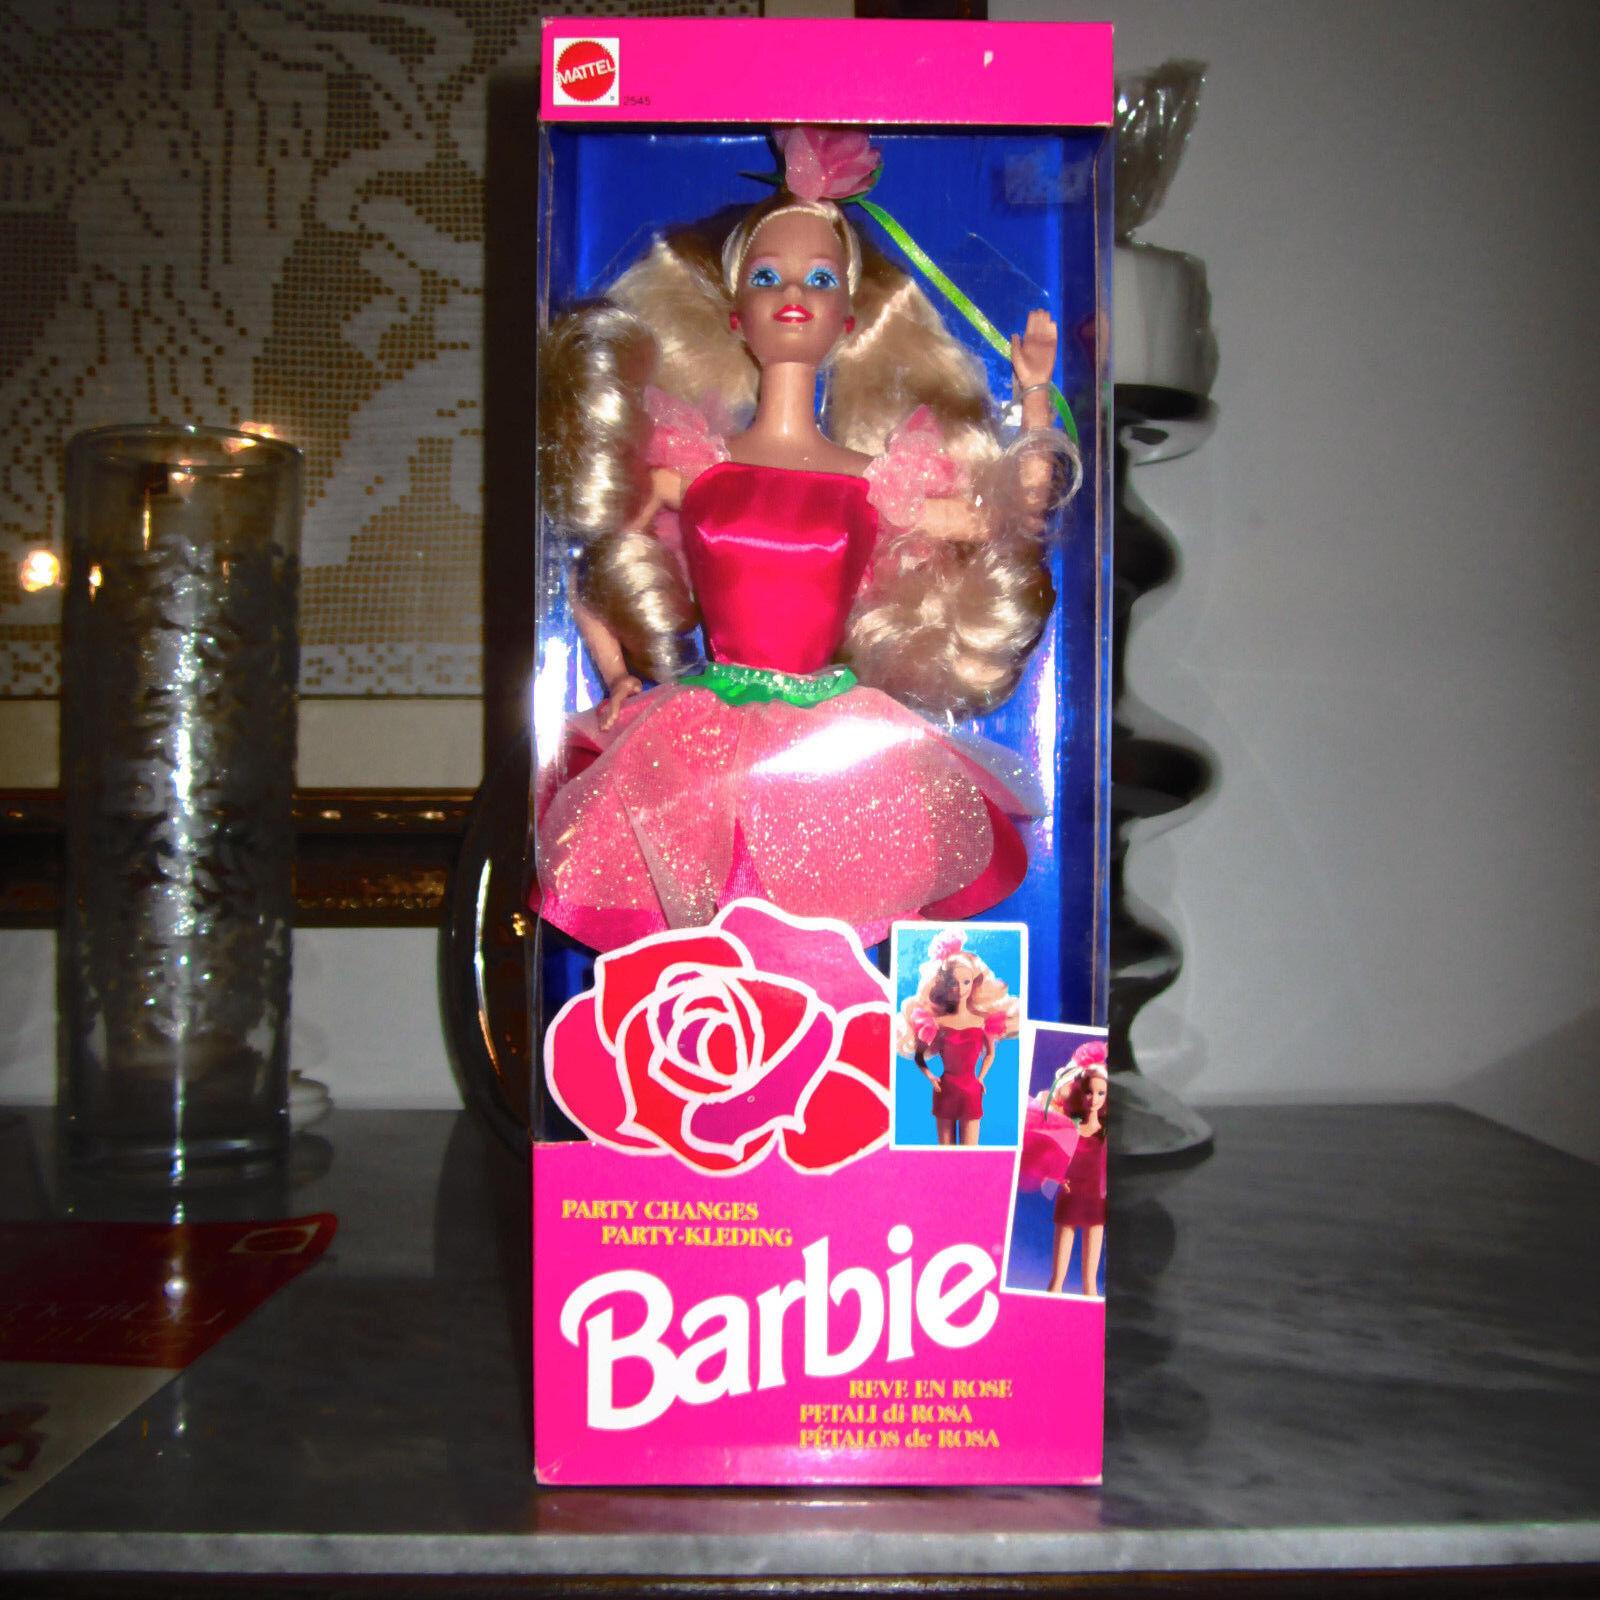 1992 Party Changes Barbie Petali di Rosa hawaiian superstar picture pretty